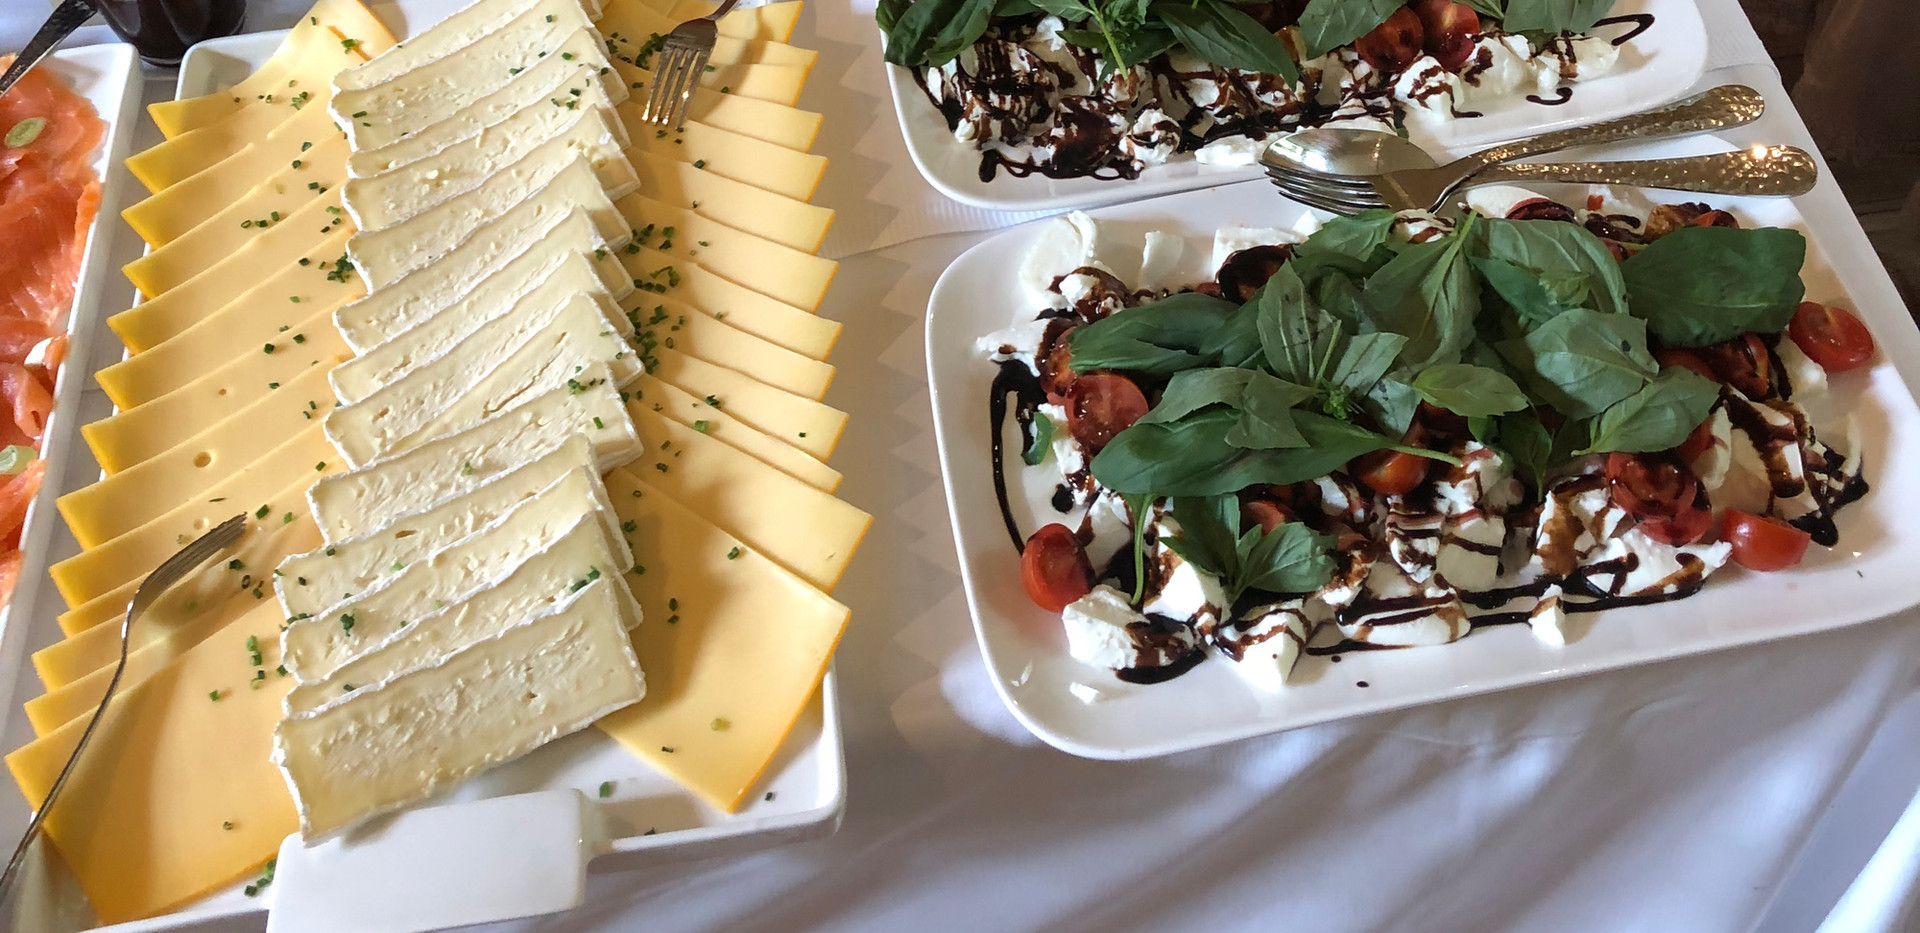 cafe-liege-aachen-catering-fruehstueck-gemischte-platten-käse-tomate-mozarella-gebaeck.jpg